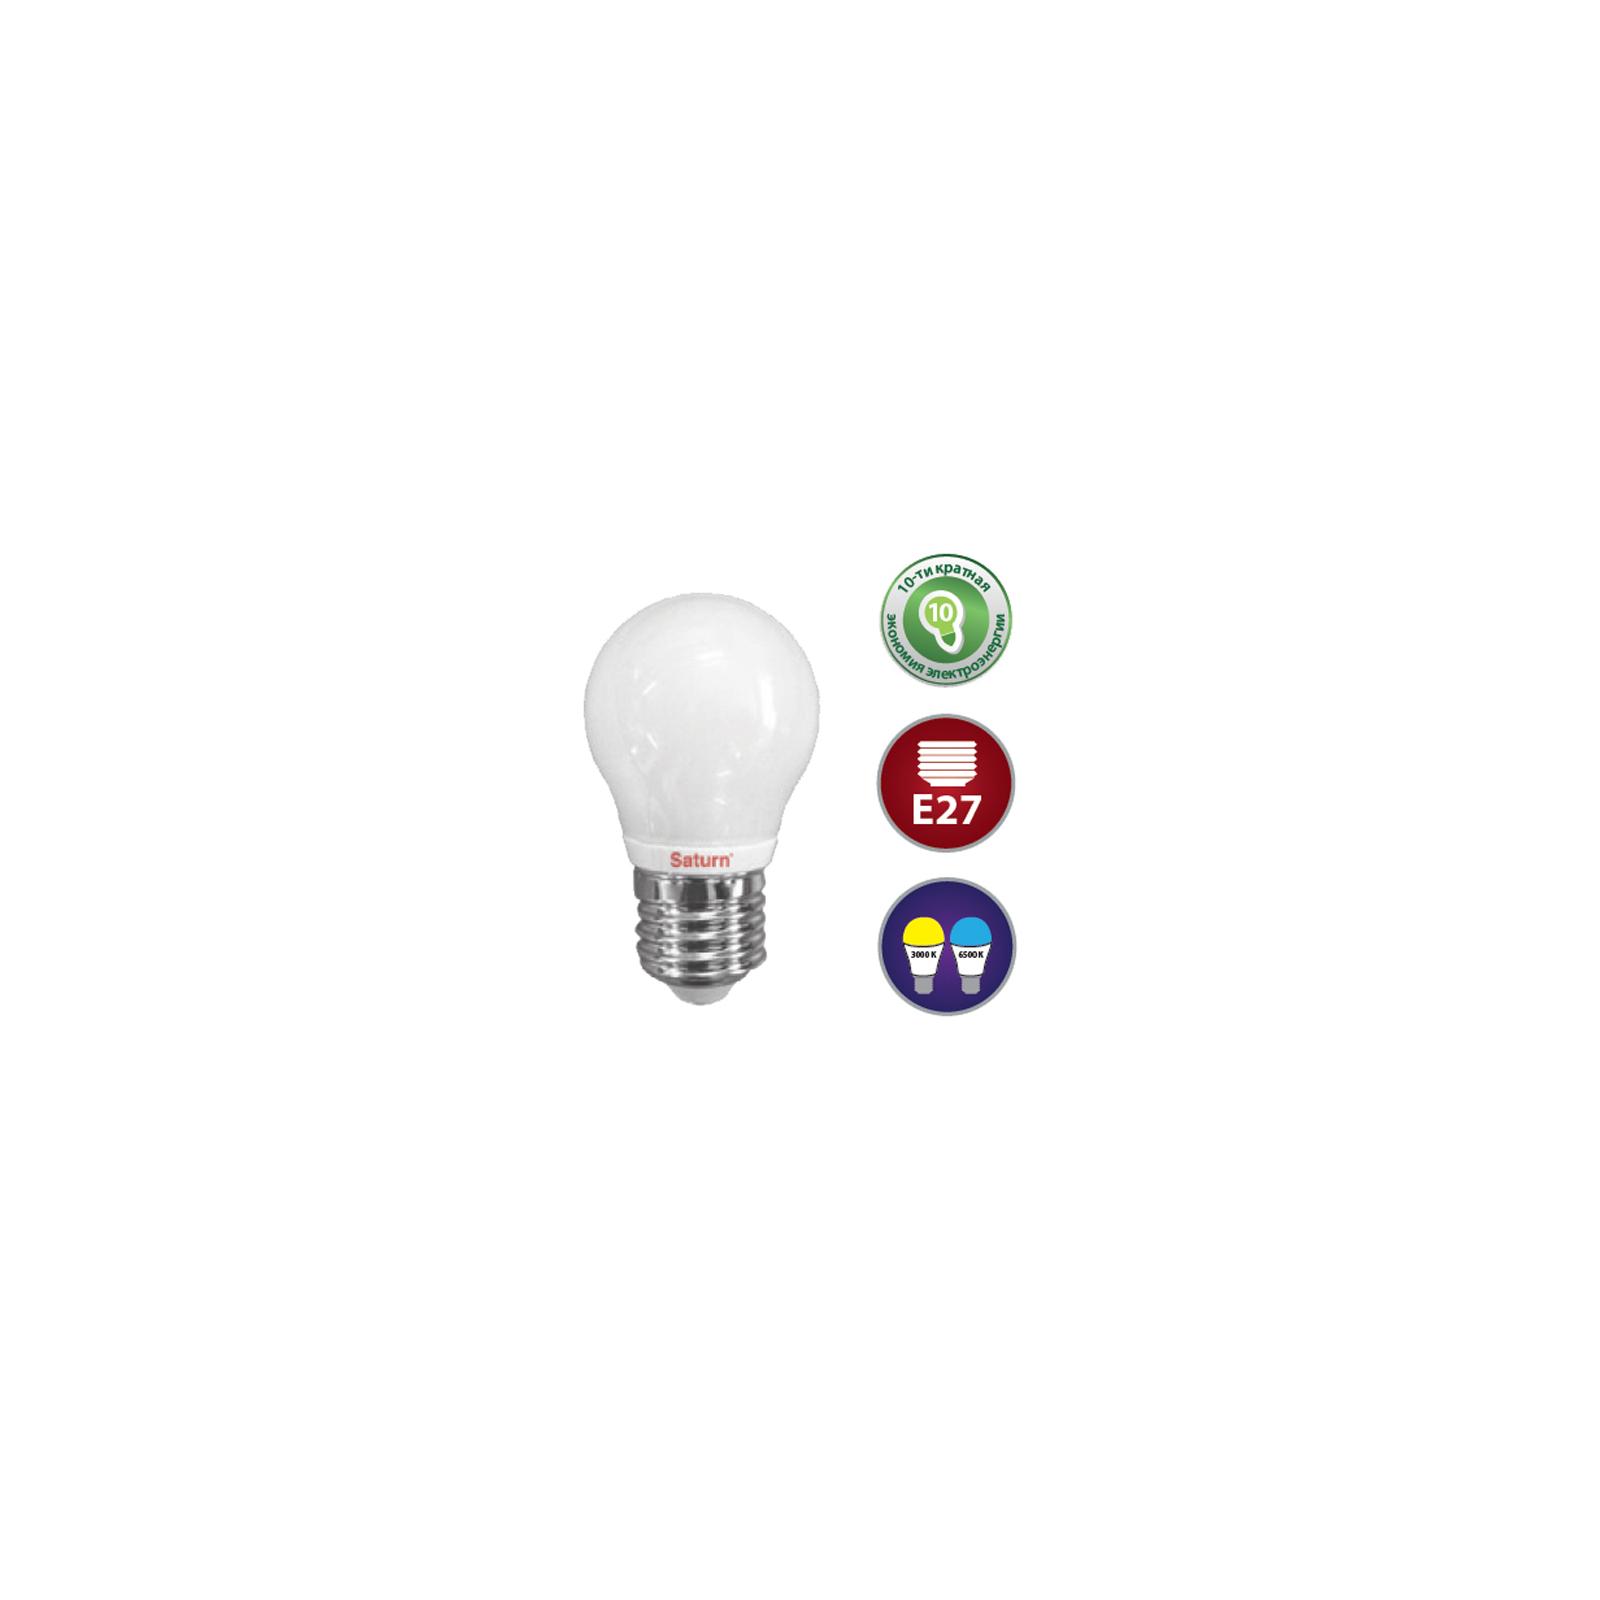 Лампочка SATURN ST-LL27.07N1 WW